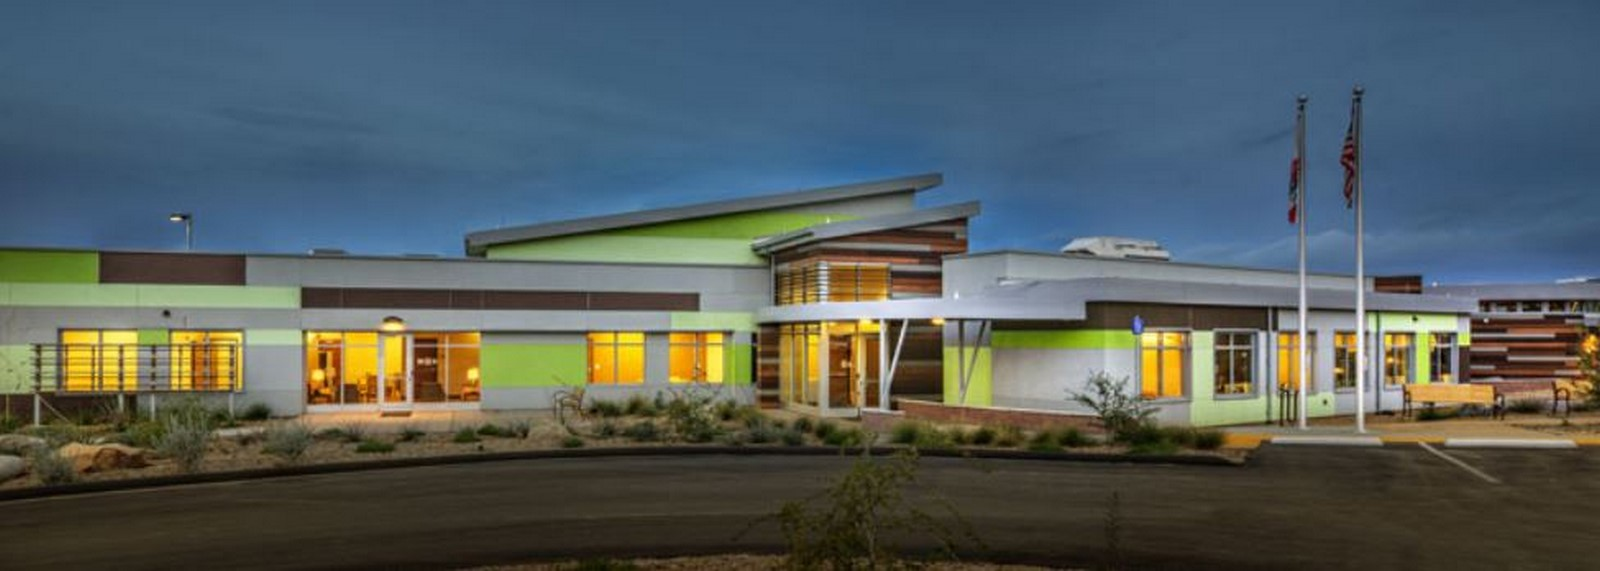 Architects in Sacramento - Top 60 Architects in Sacramento - Sheet9